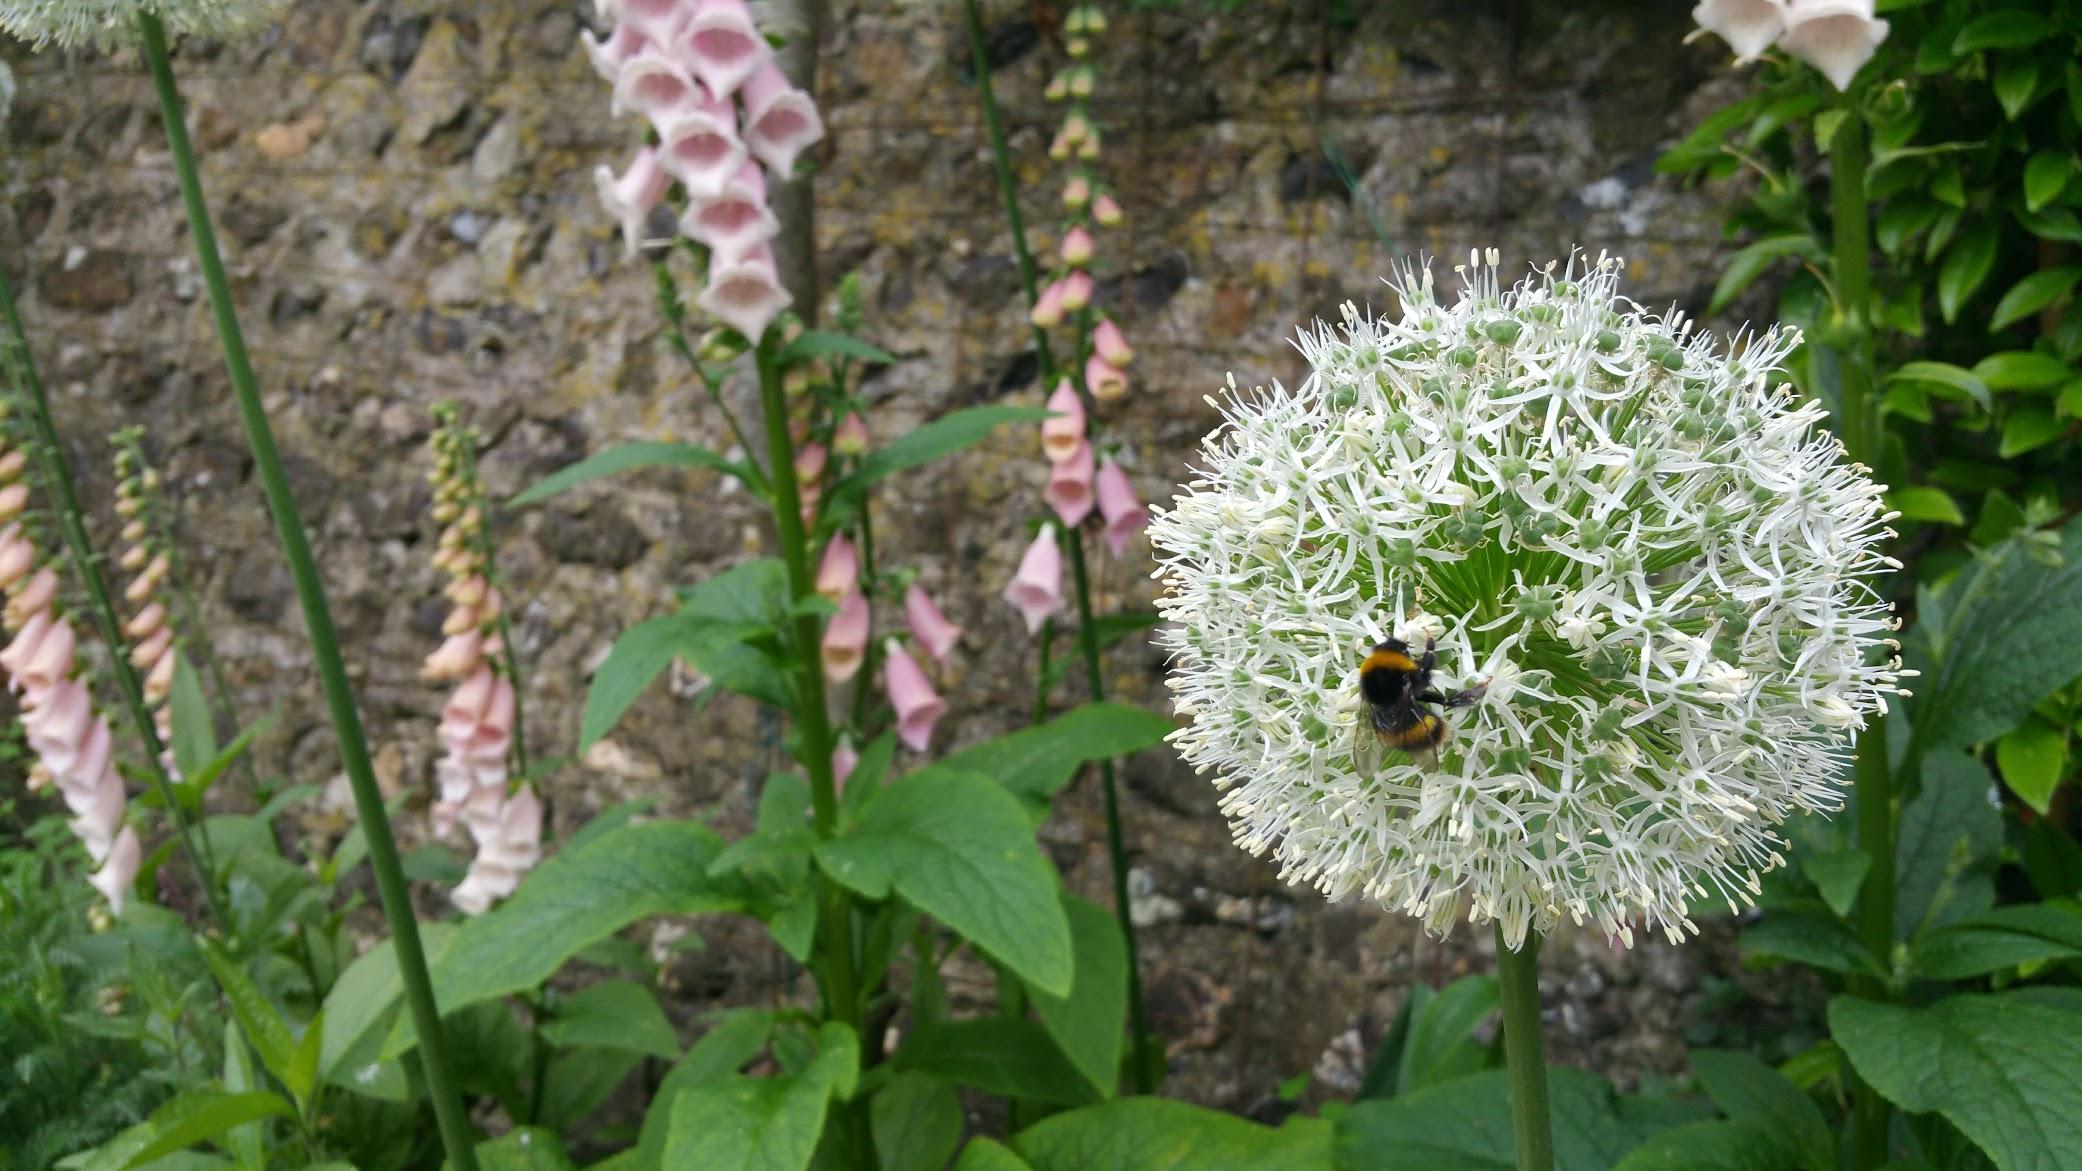 whitealliumbee